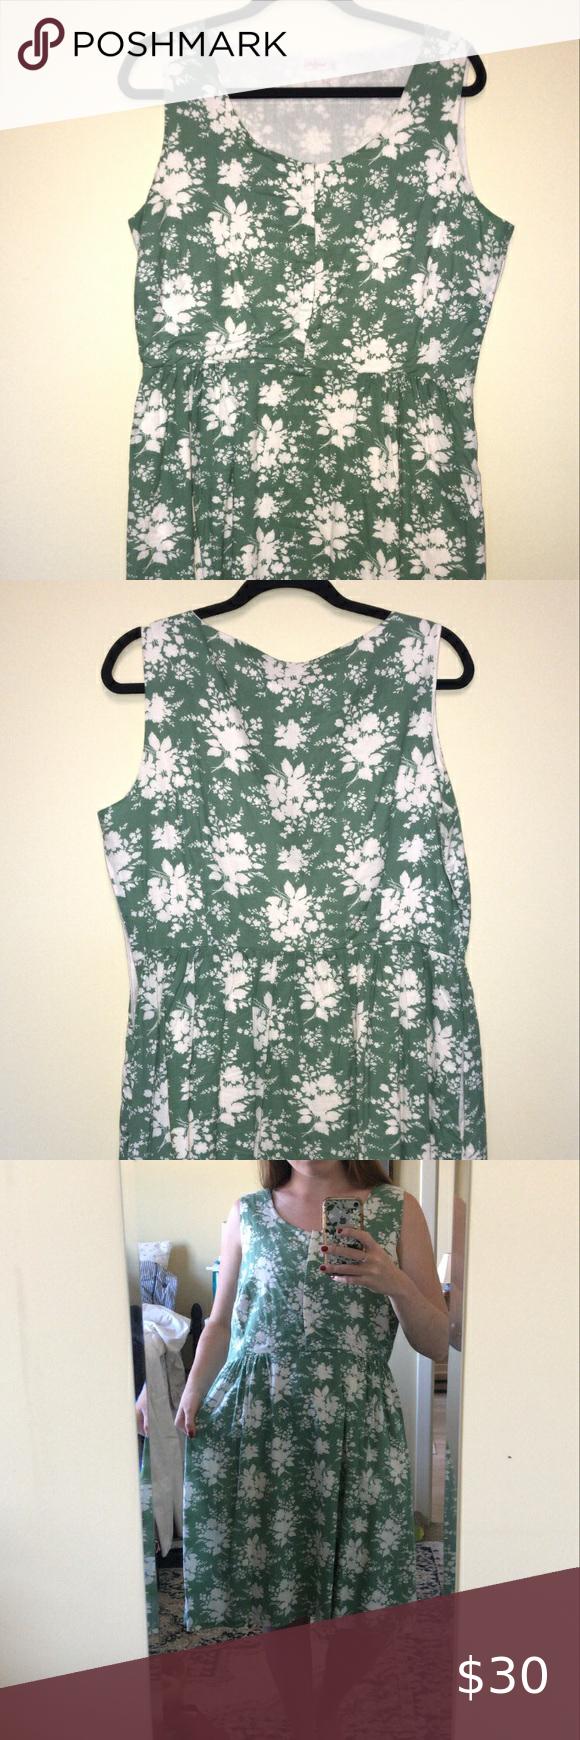 Cath Kidston Green Summer Dress Size 16 Summer Dresses Green Summer Dresses Size 16 Dresses [ 1740 x 580 Pixel ]